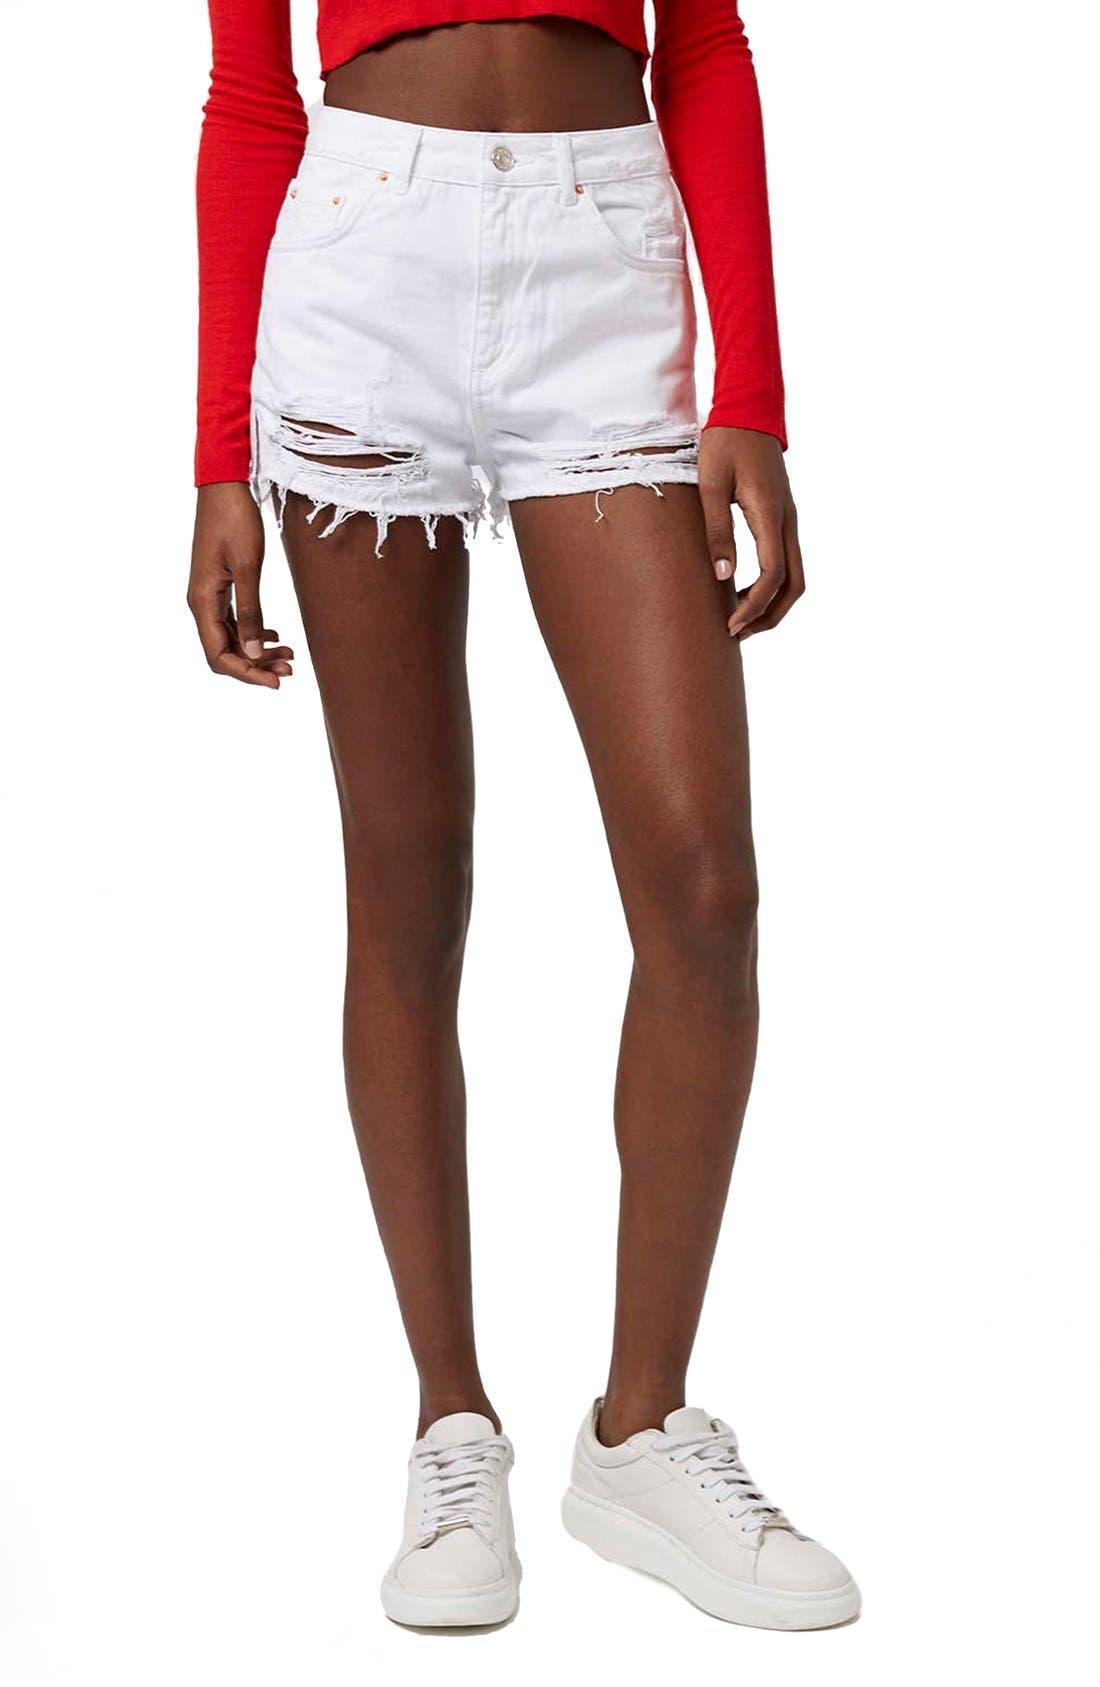 Alternate Image 1 Selected - Topshop High Rise Ripped Denim Shorts